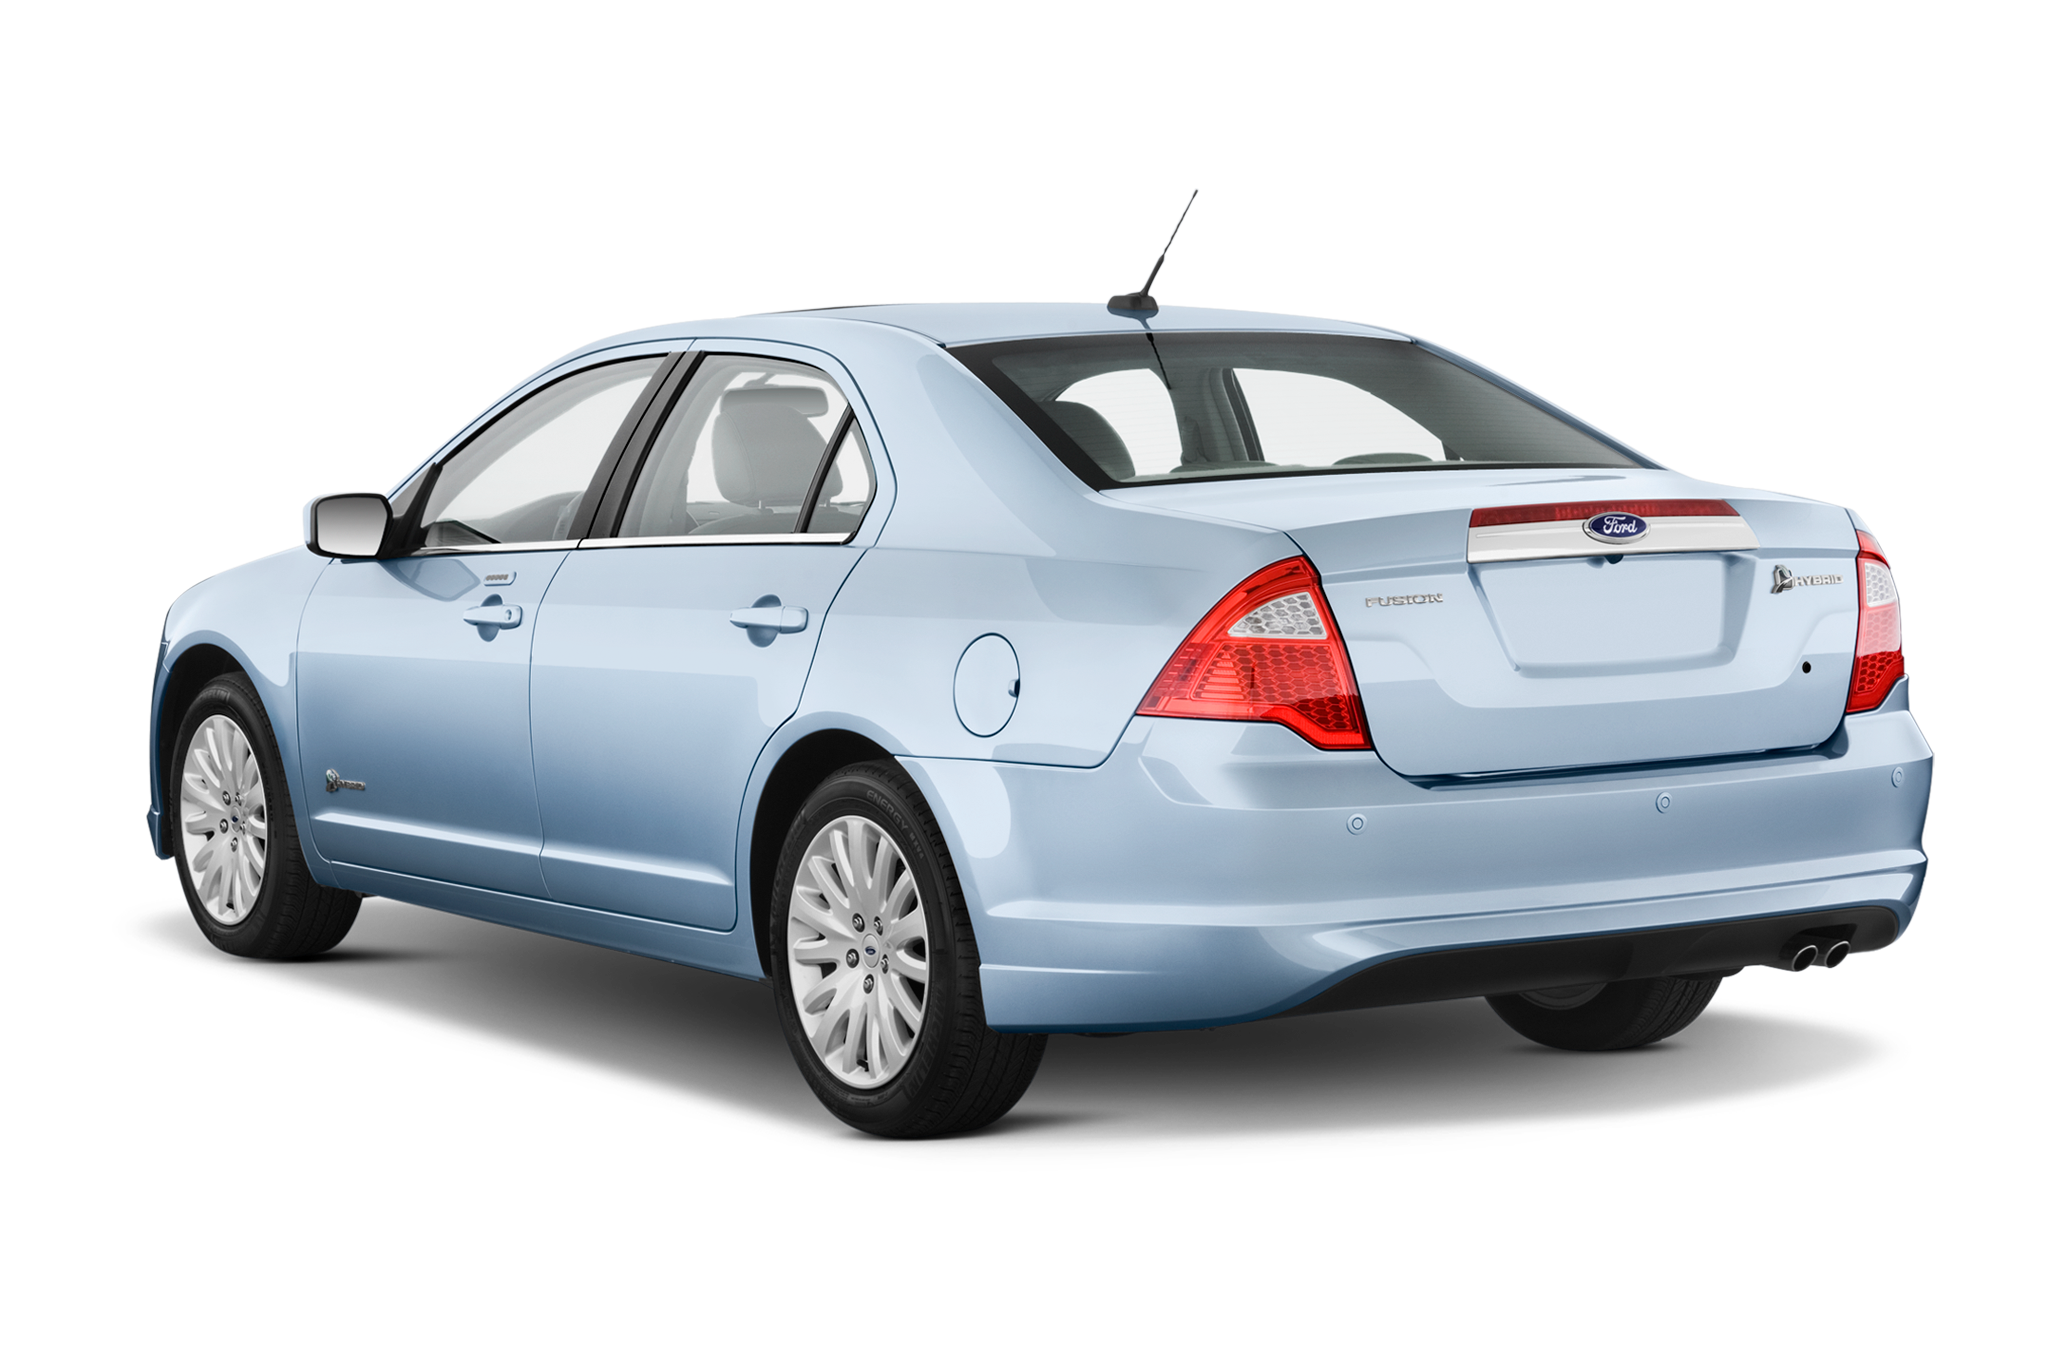 Ford Fusion (North America) I 2005 - 2012 Sedan #5